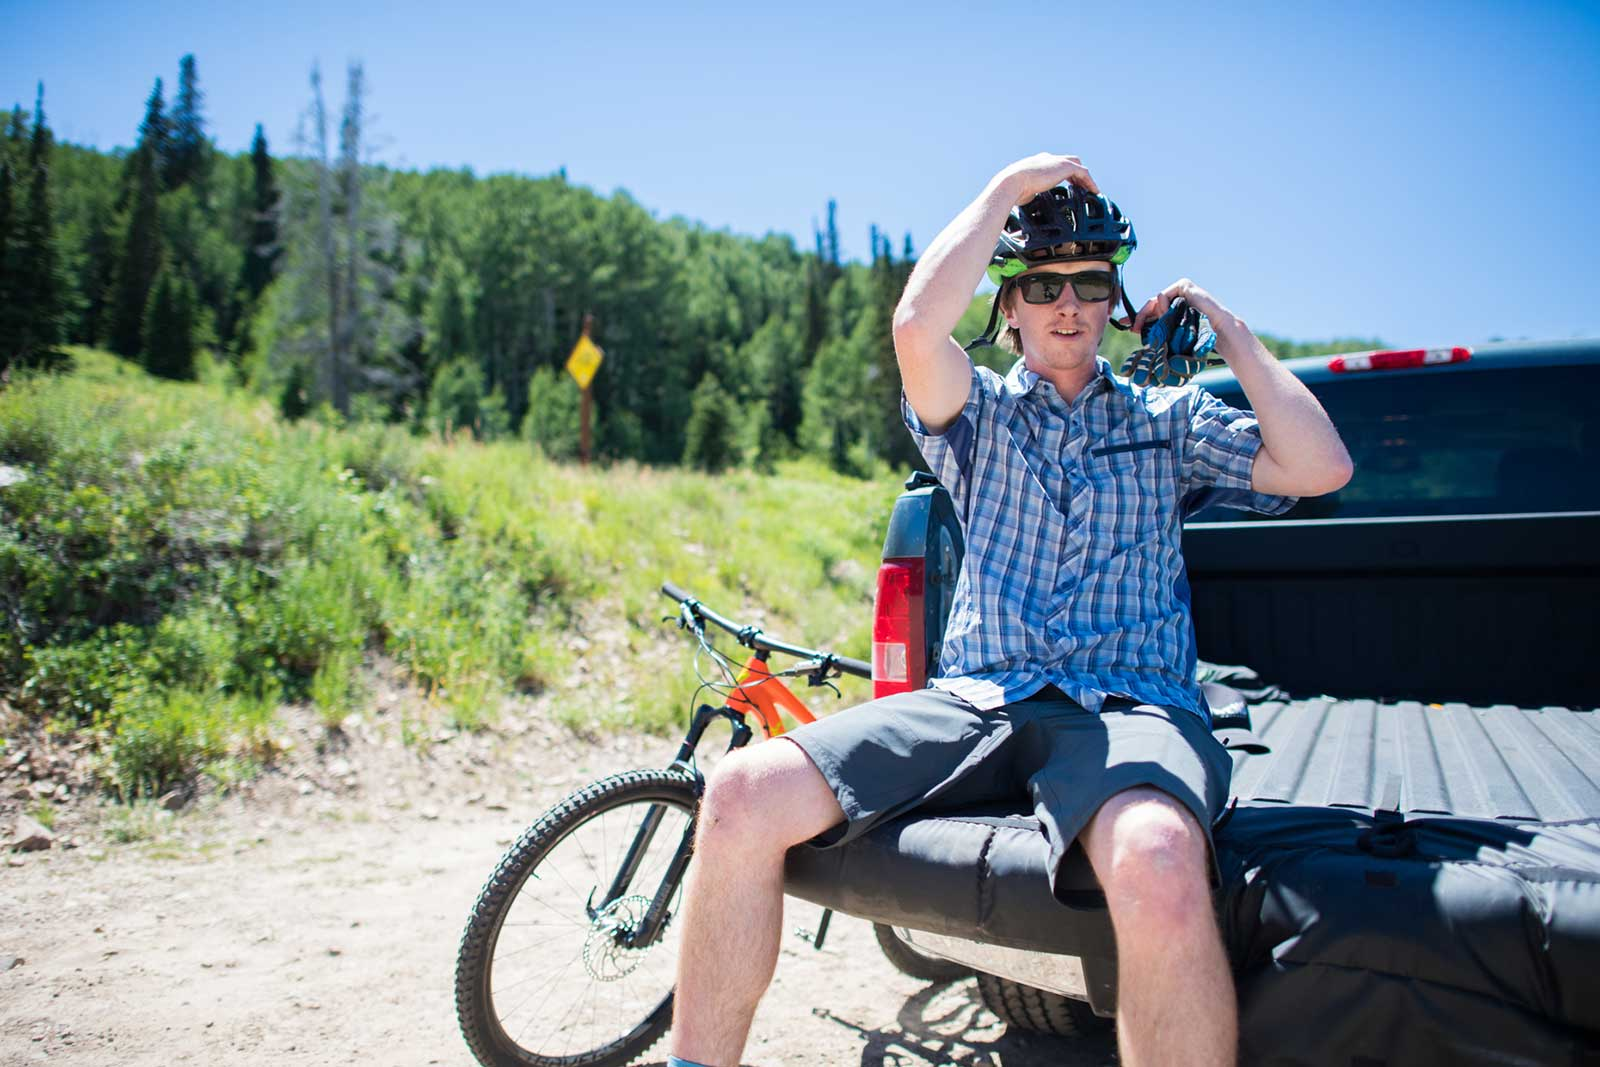 Cycling Lightweight Club Ride Mens Crush Bike Shorts Biking